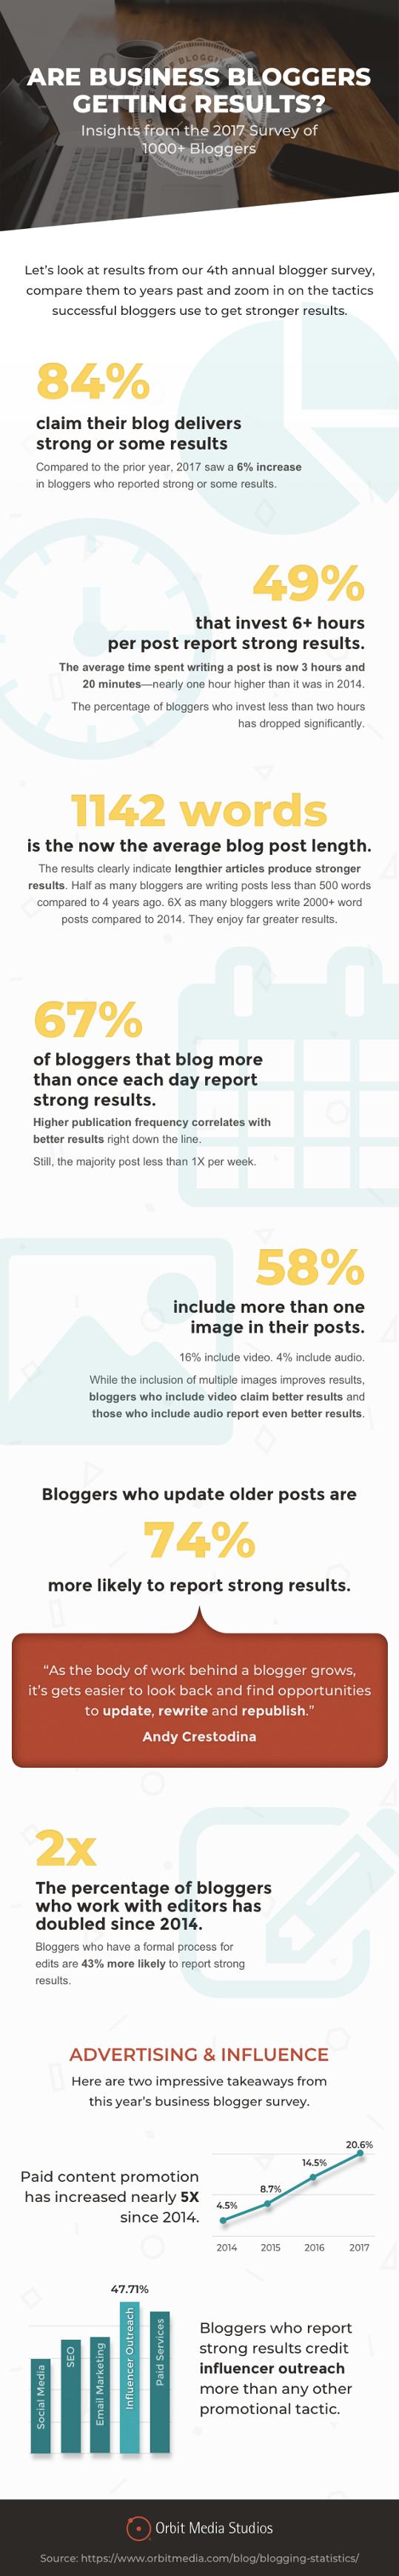 Infografica sulle perfomance dei blog nel 2017